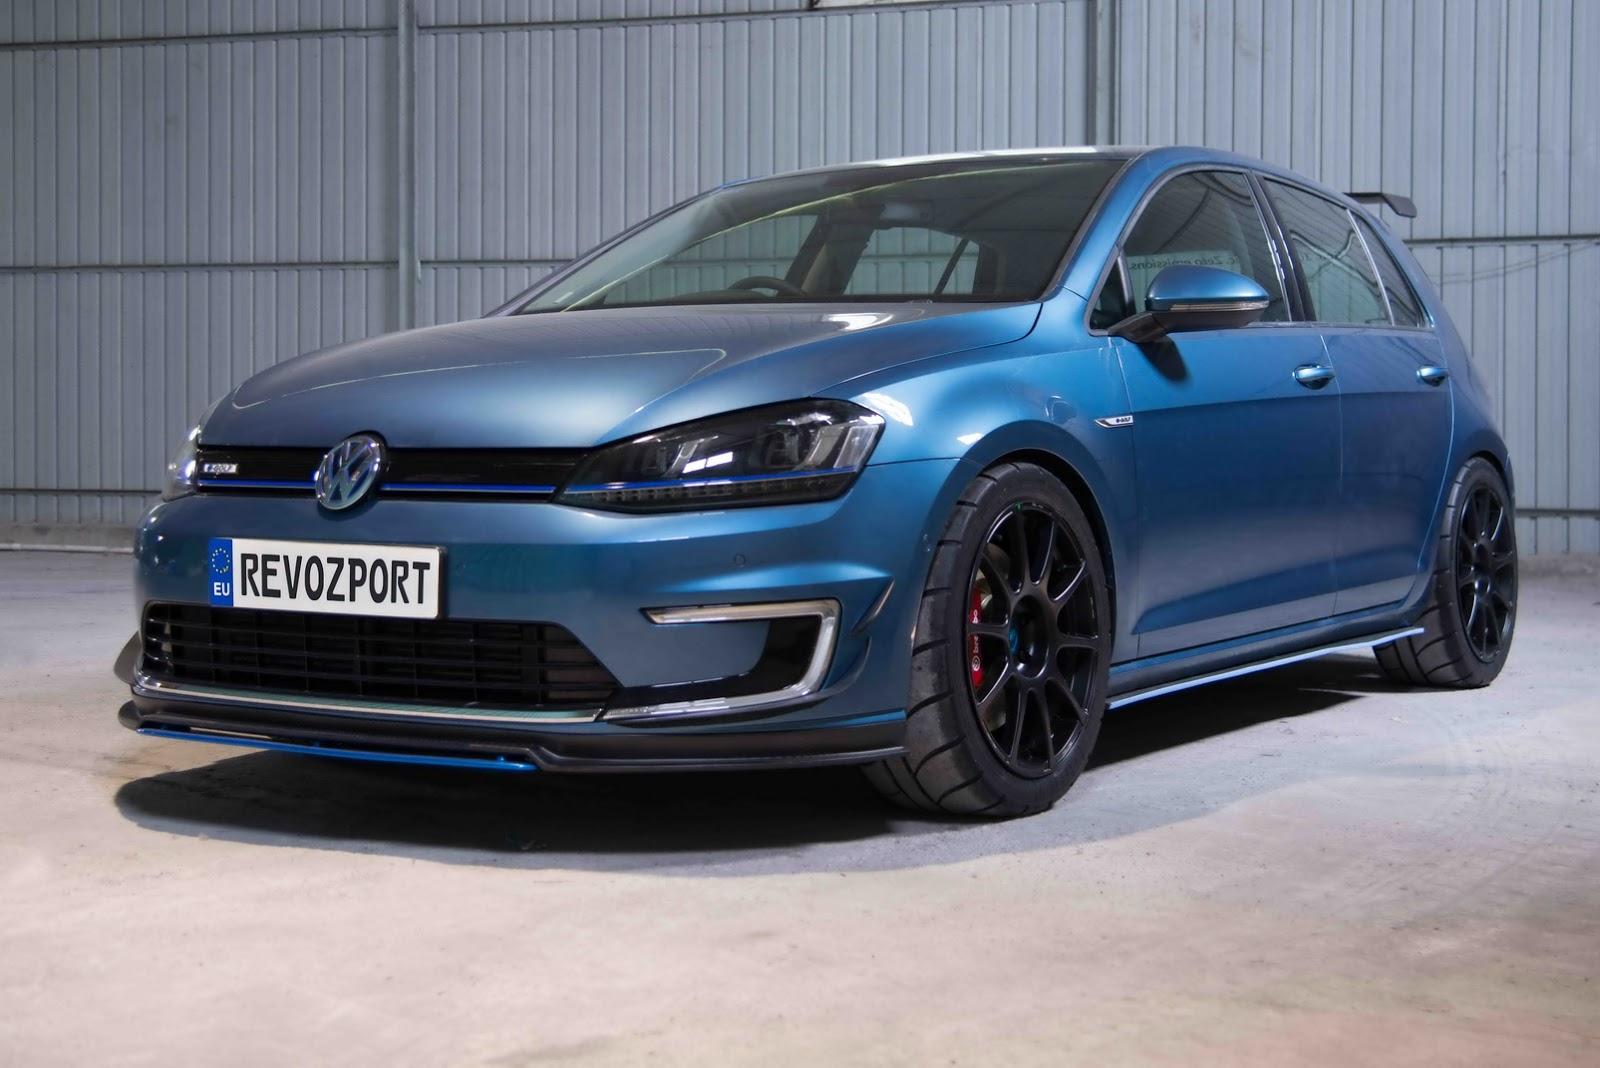 Volkswagen_e-Golf_Razor_7E_by_RevoZport_21